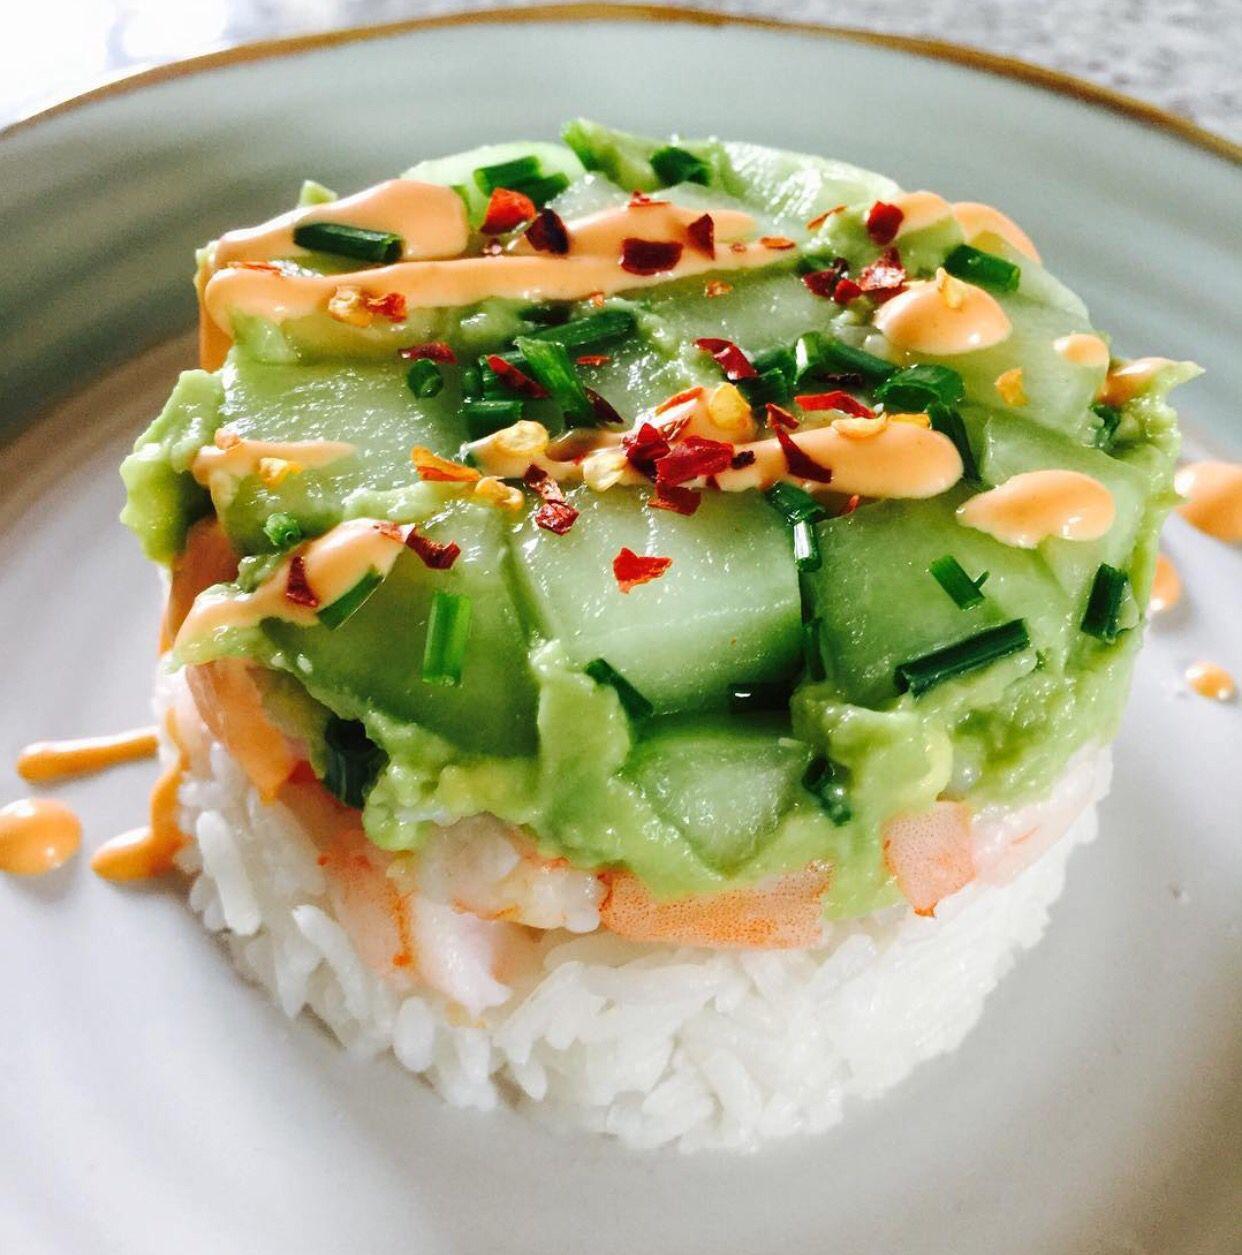 Jasmine rice, shrimp, avocado, cucumber, chili flakes, chives, sriracha cream sauce